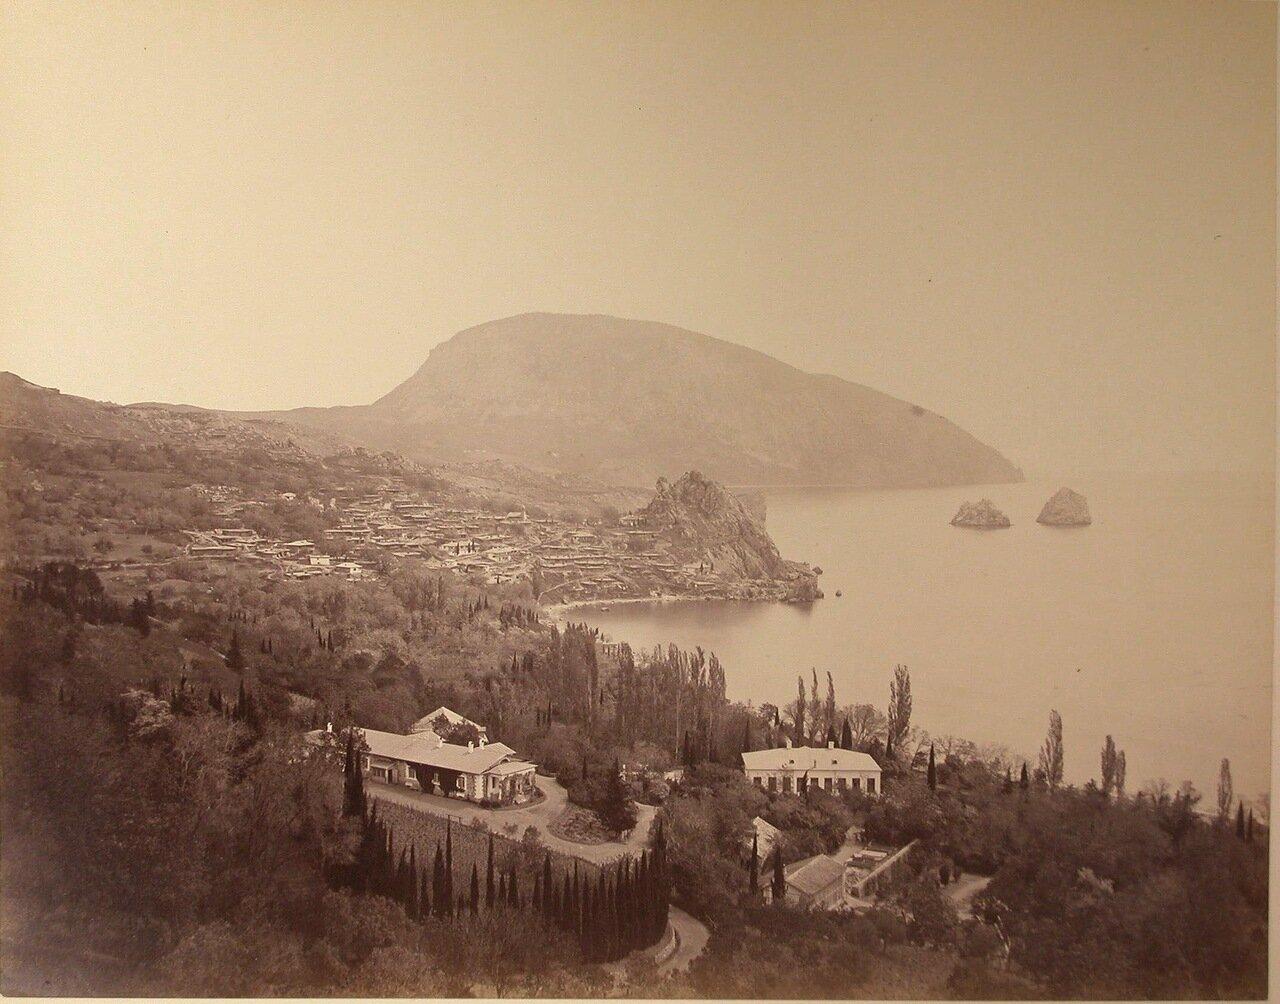 34. Вид на город; справа - скалы Адалары, на втором плане - гора Аю-Даг